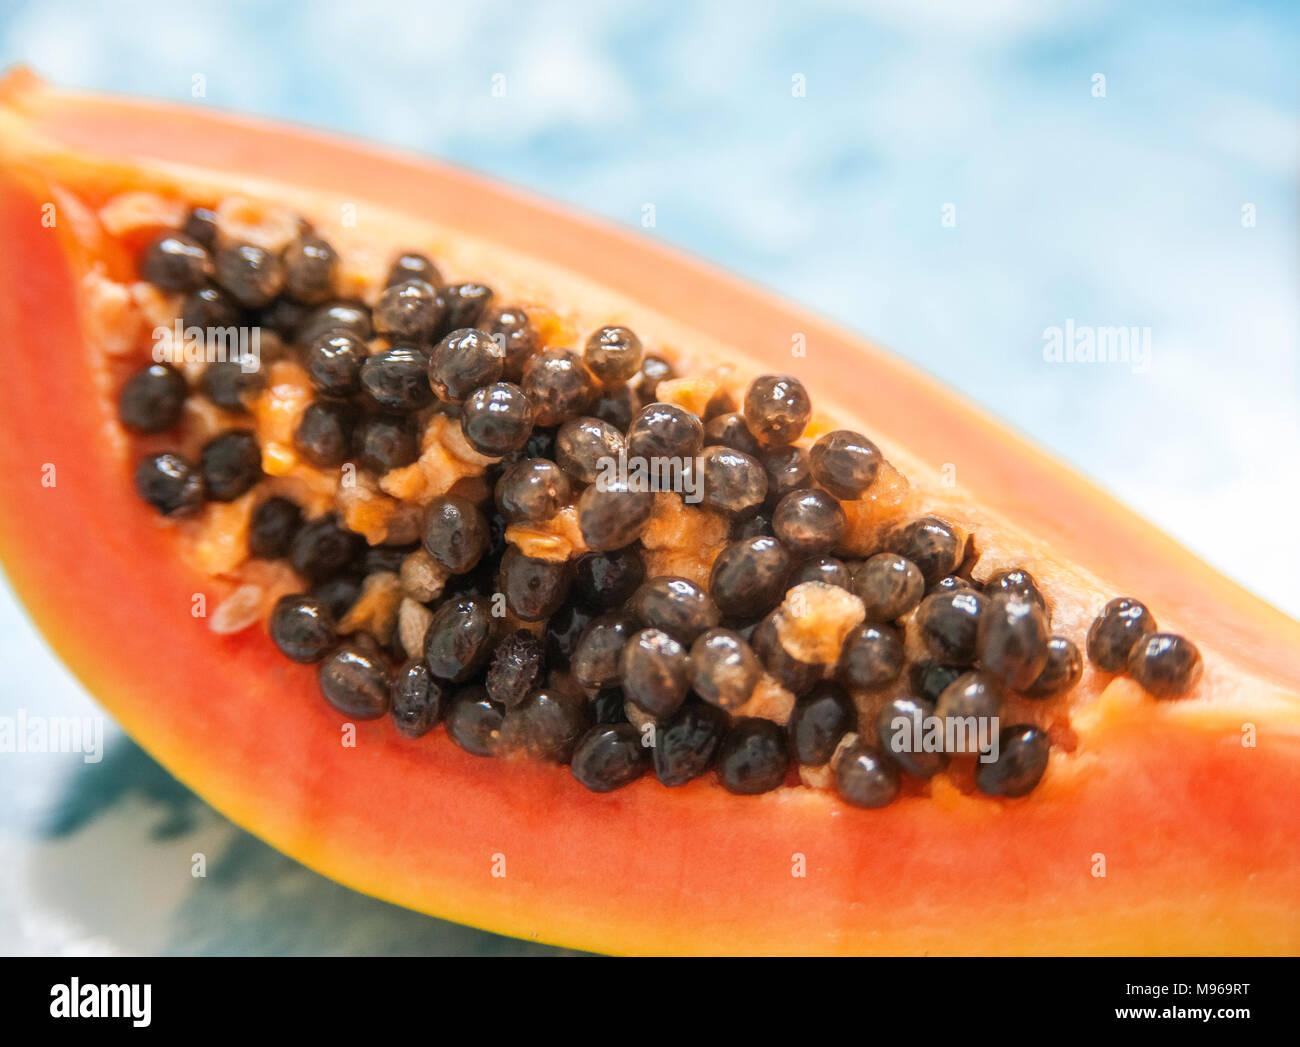 Cut slices of papaya with seeds. Macro mode - Stock Image